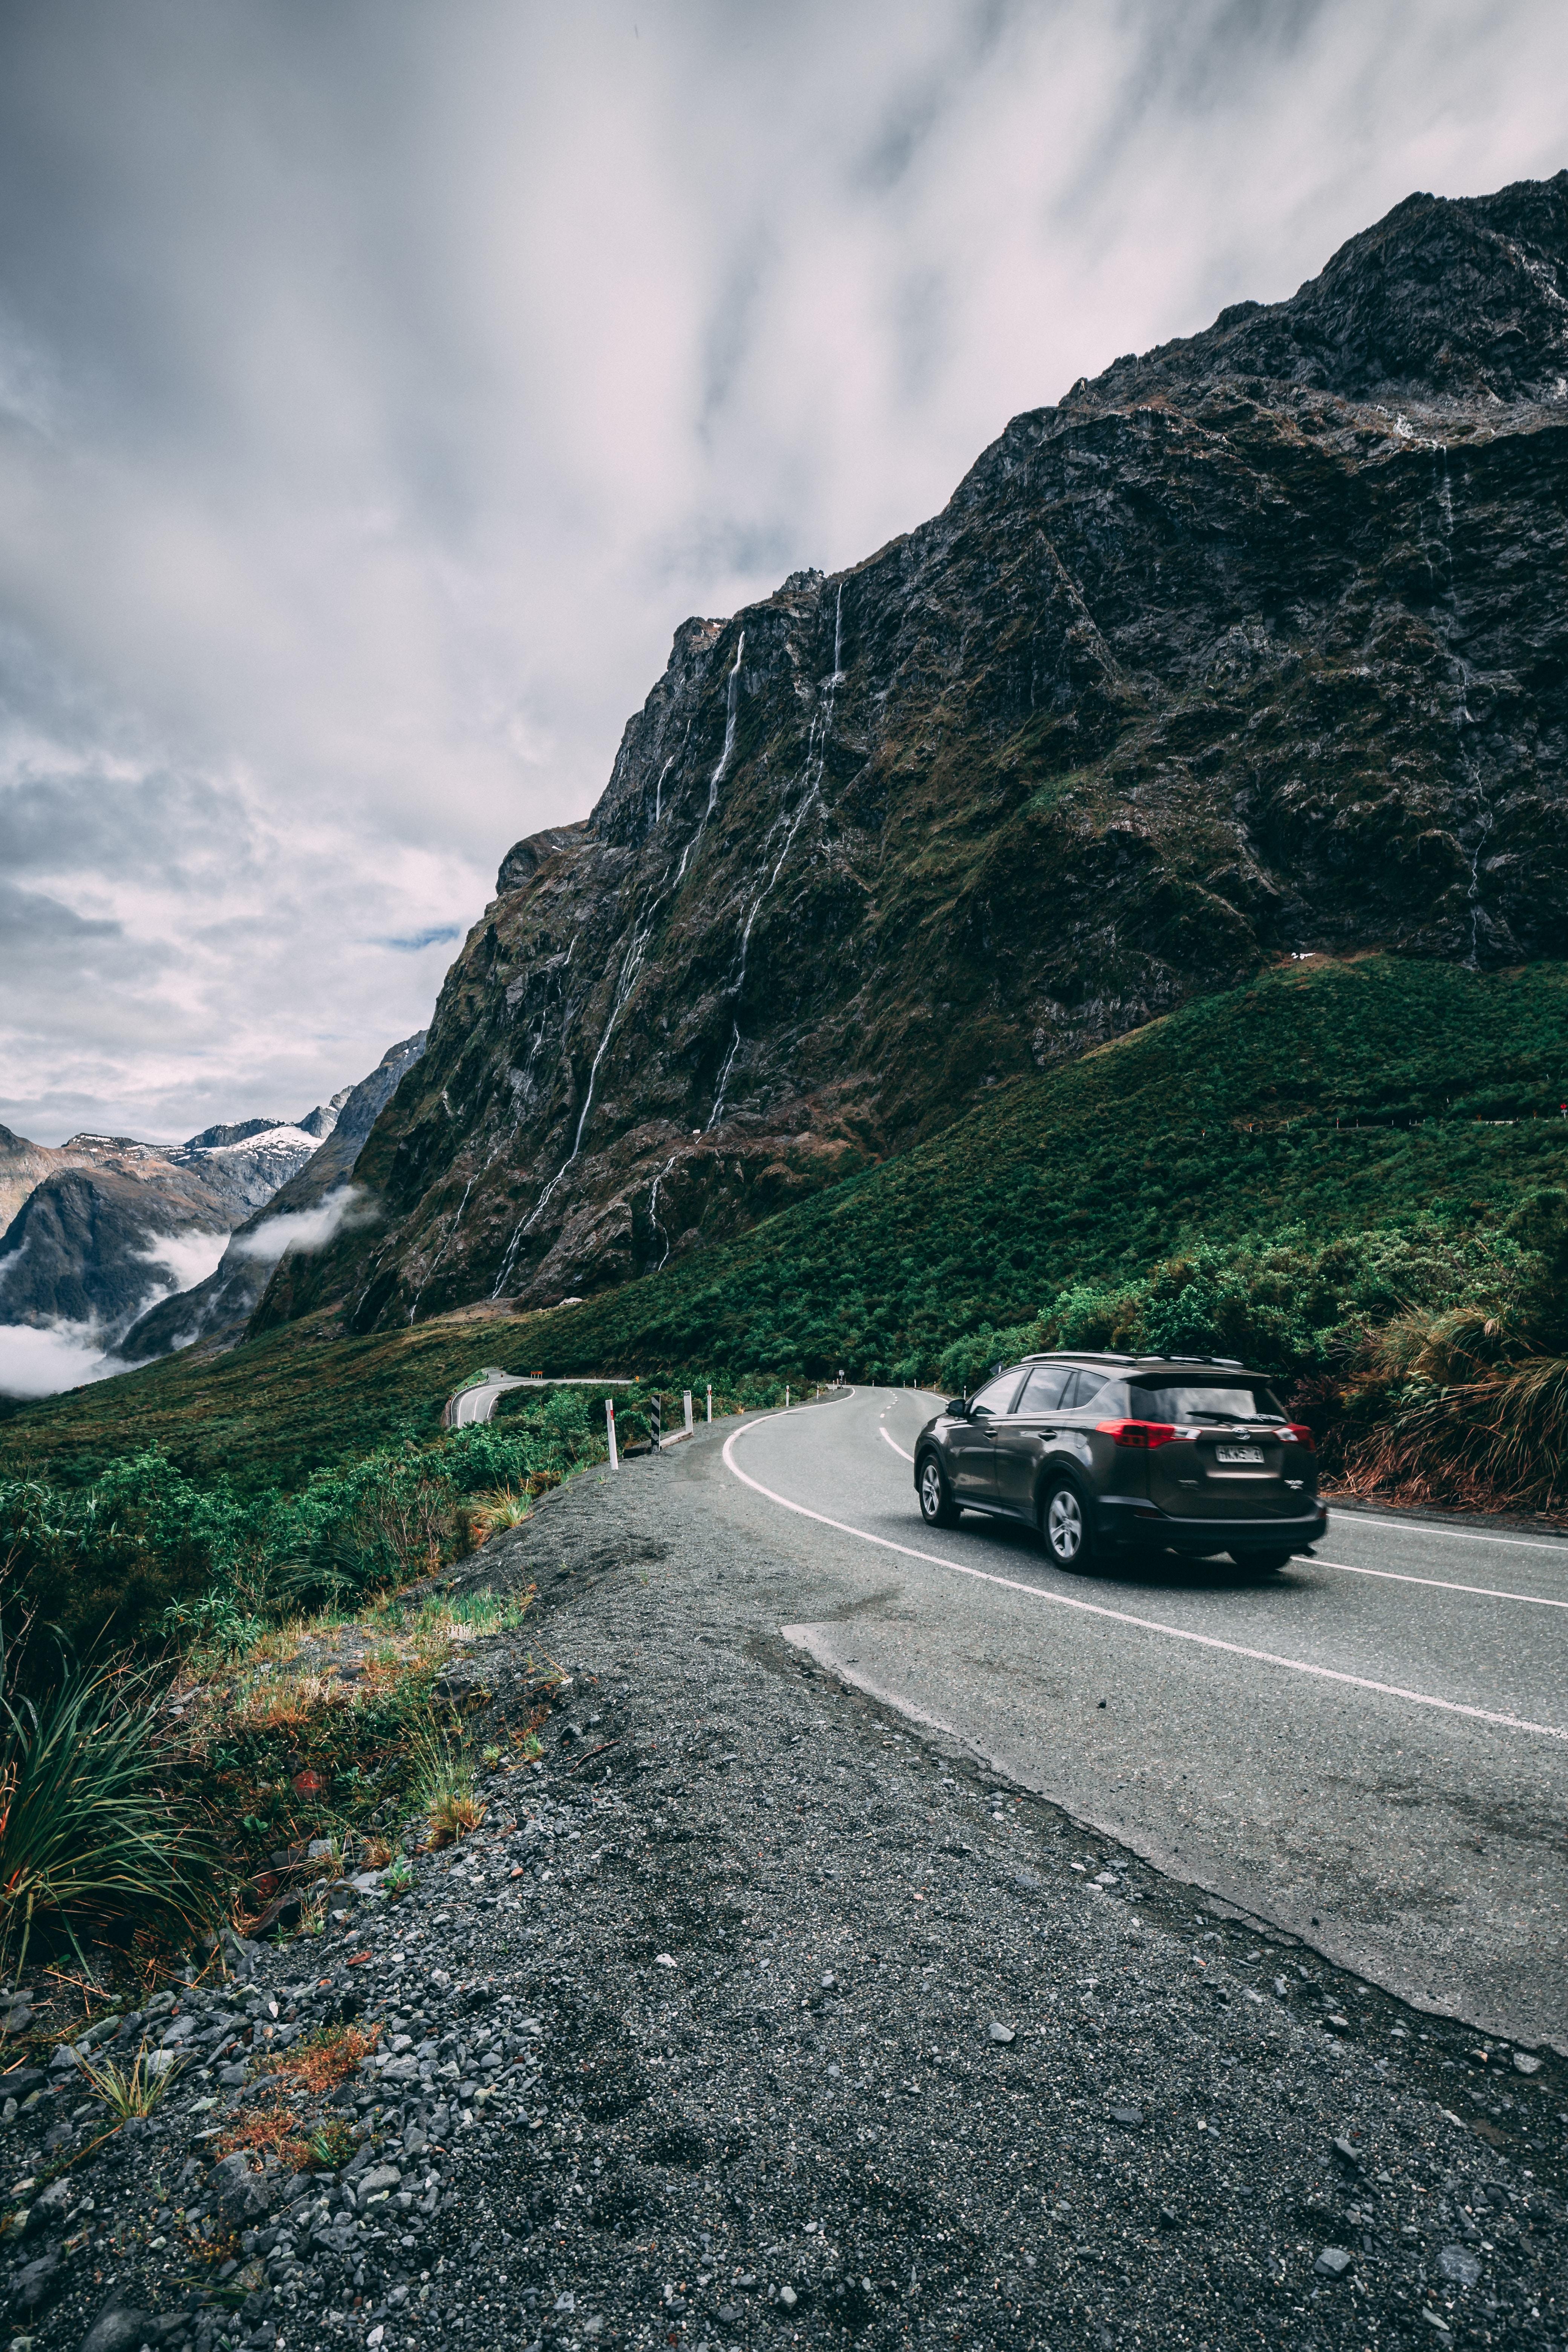 car on road near mountain